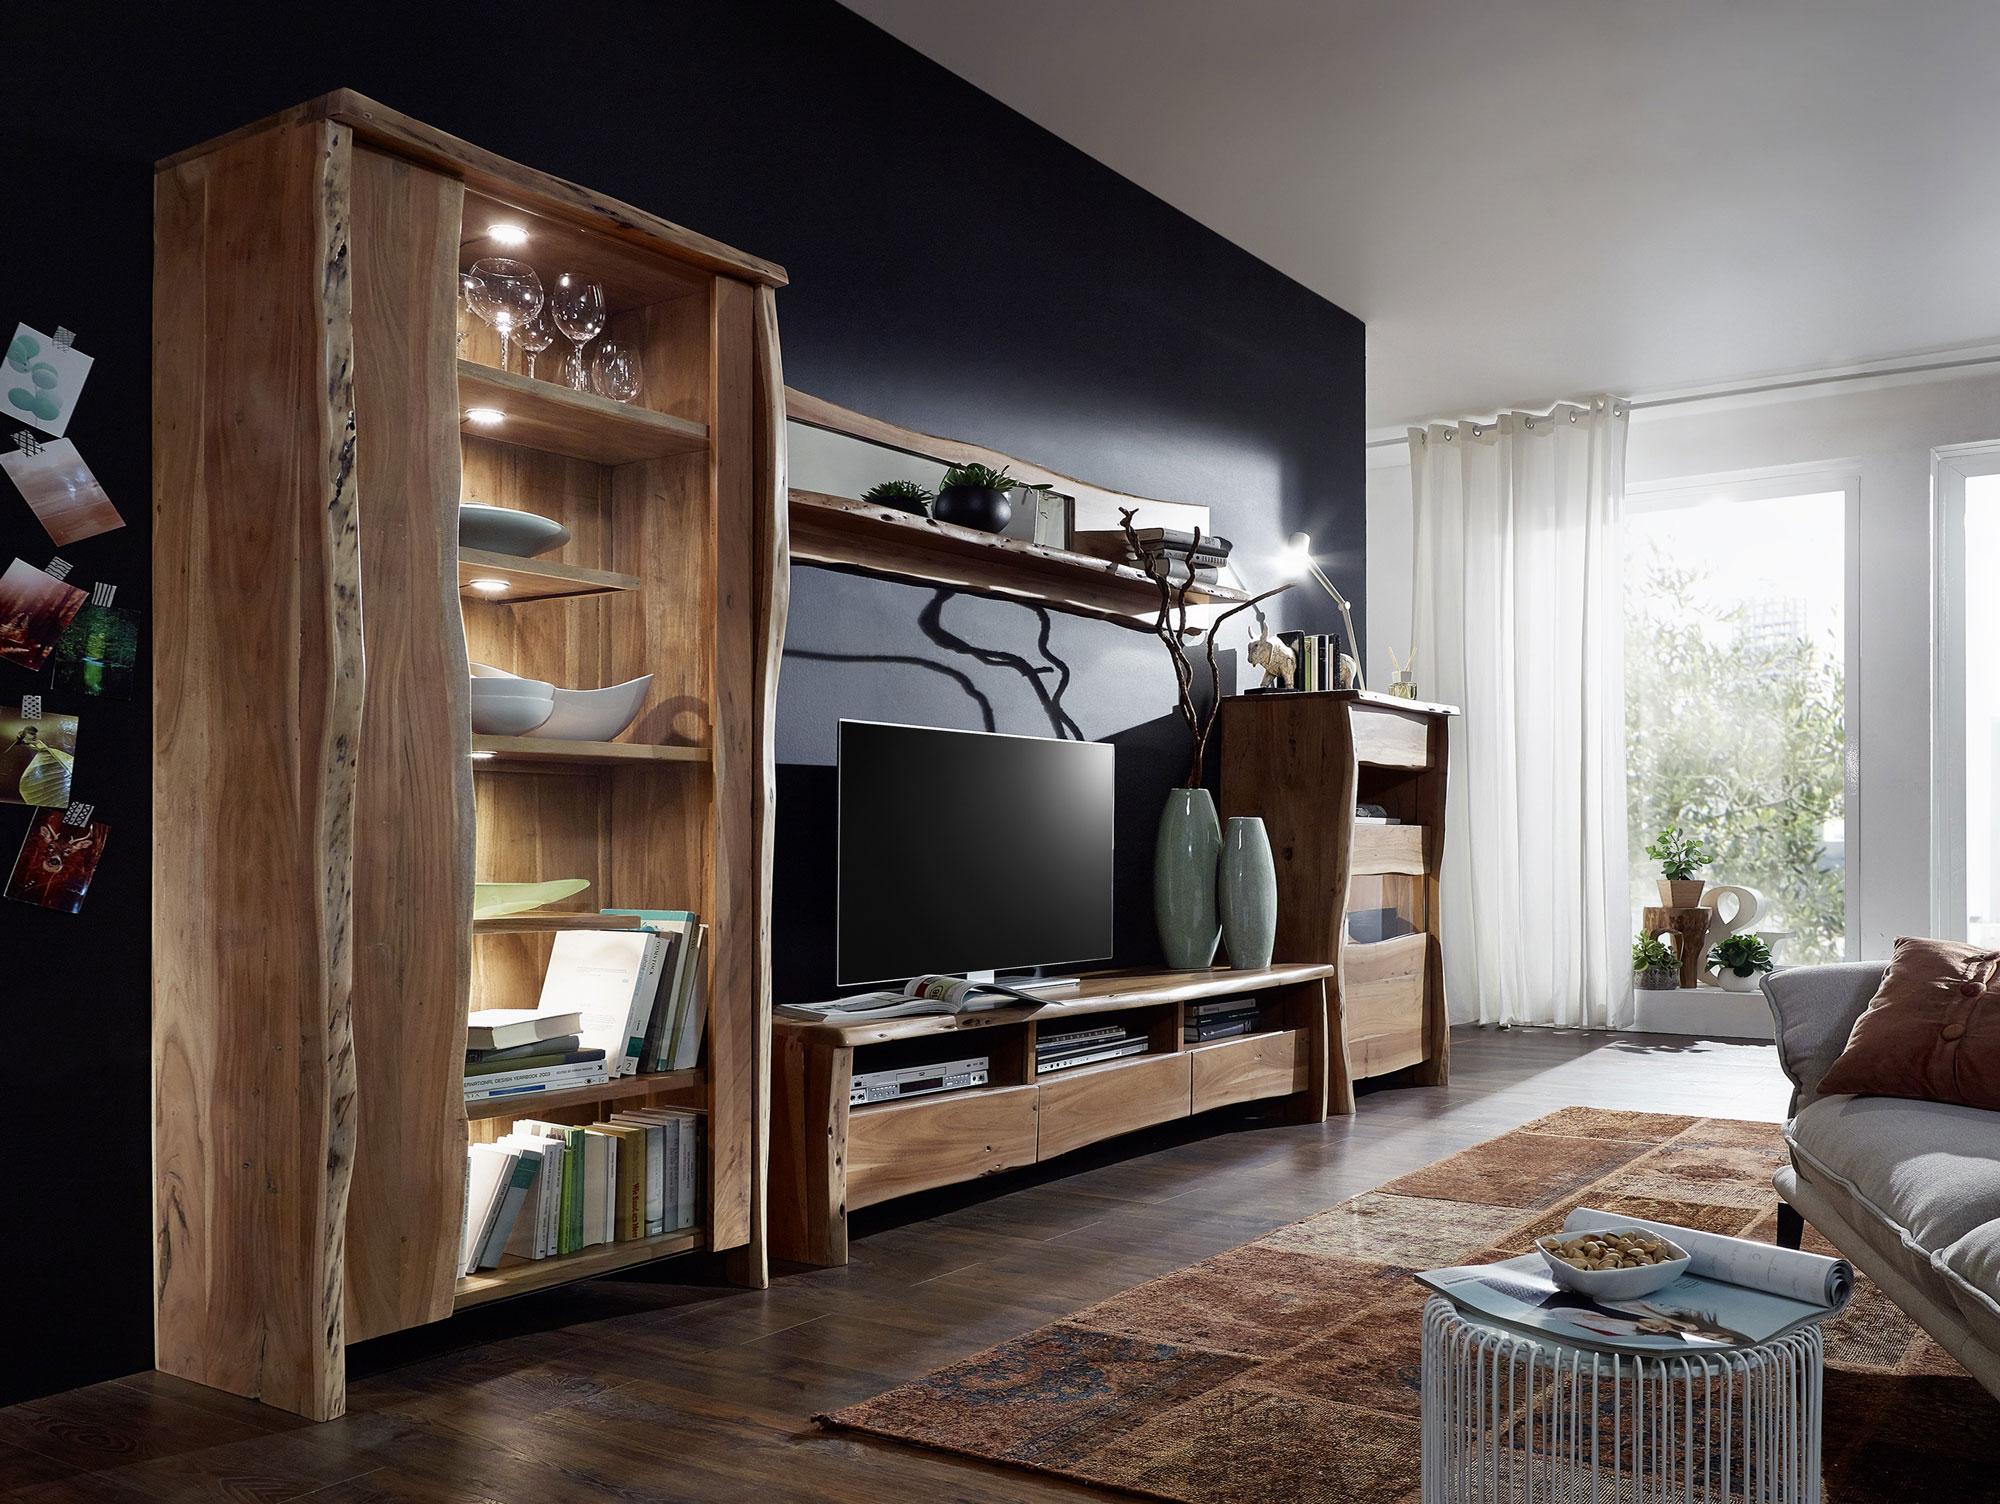 sunny wohnwand akazie lackiert. Black Bedroom Furniture Sets. Home Design Ideas